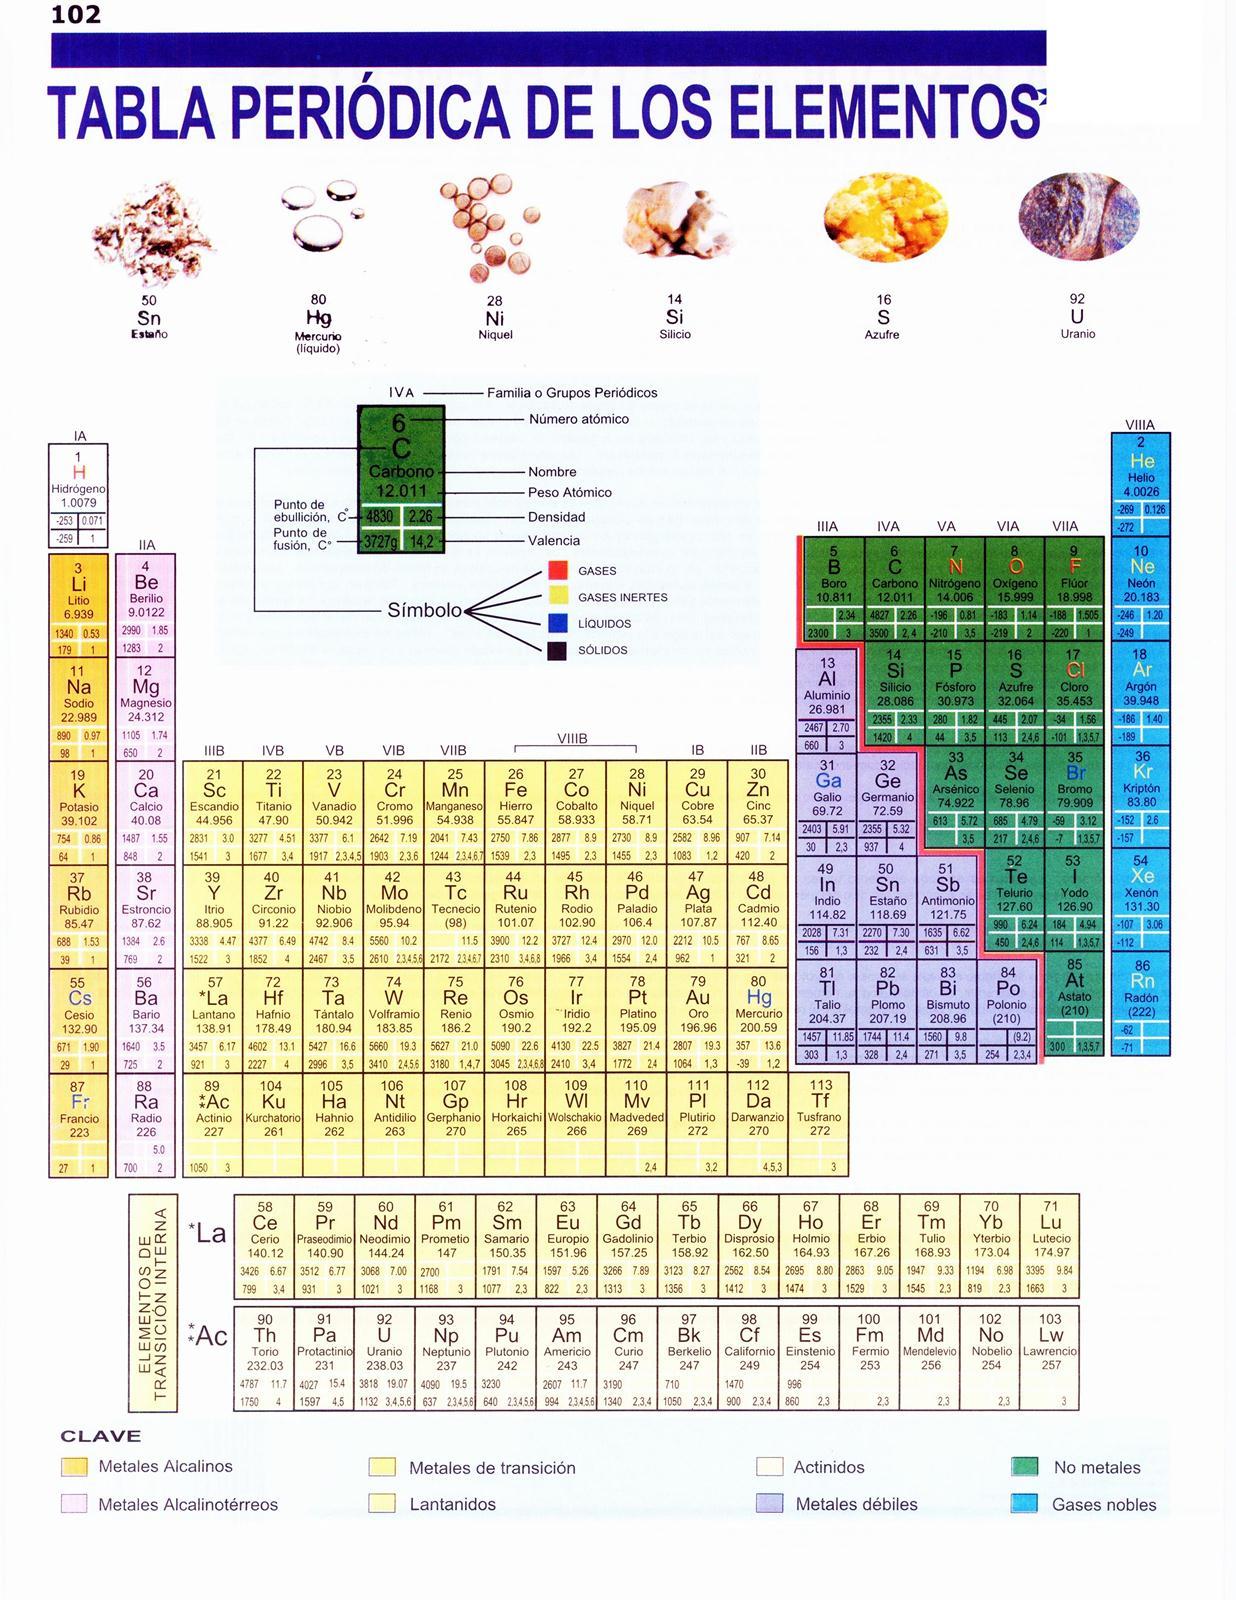 Lamina tabla periodica elementos lamina tabla periodica elementos da clic en la imagen para ver la lmina en tamao completol urtaz Choice Image